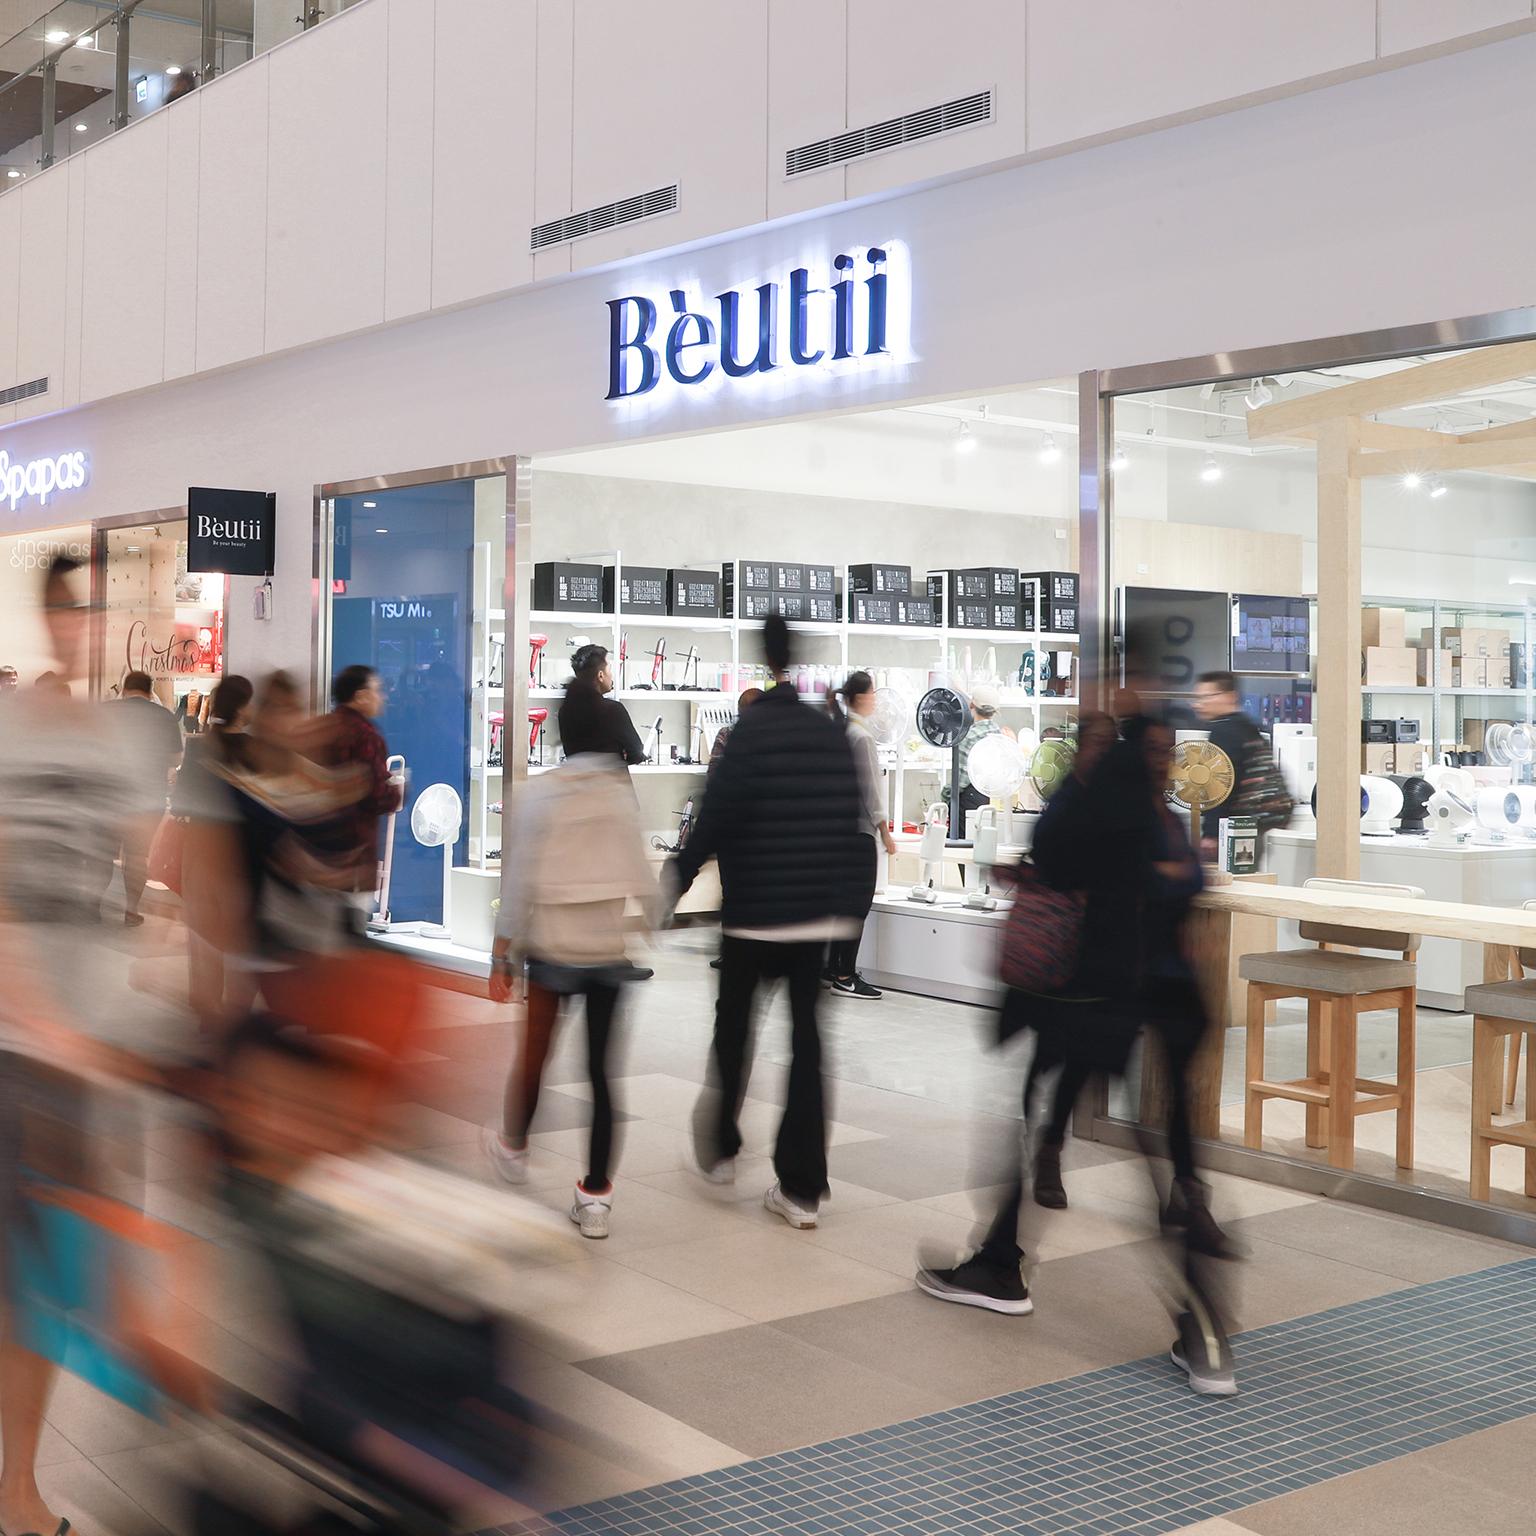 Beutii 台中港三井店